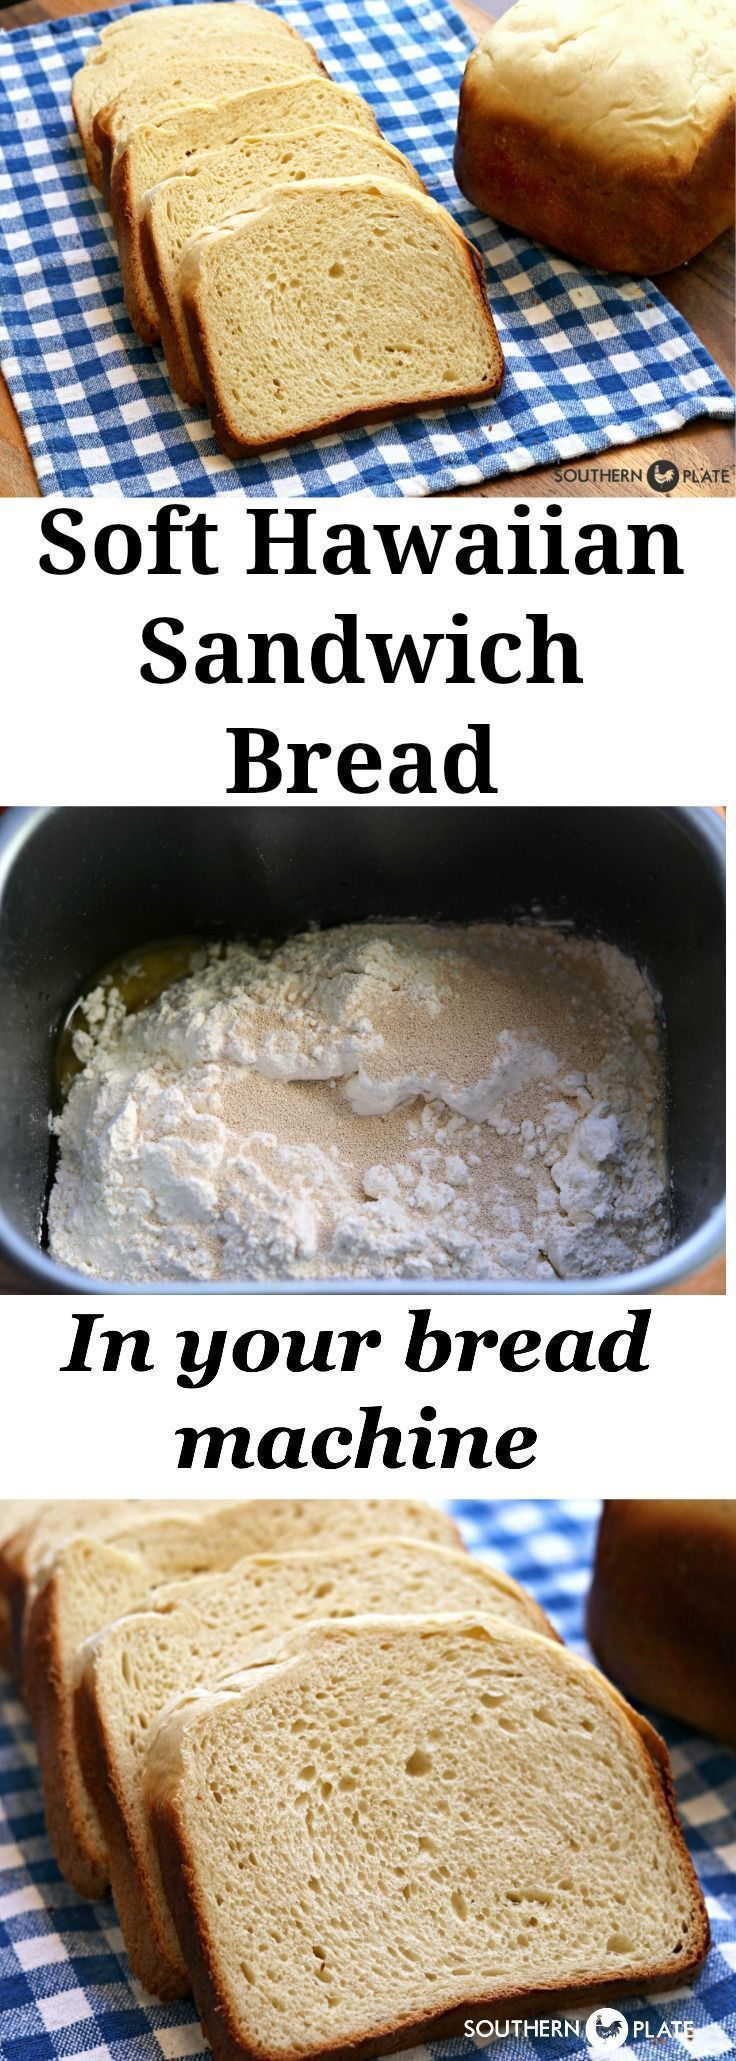 soft hawaiian sandwich bread homemade bread machine recipe #easy #recipes #bread